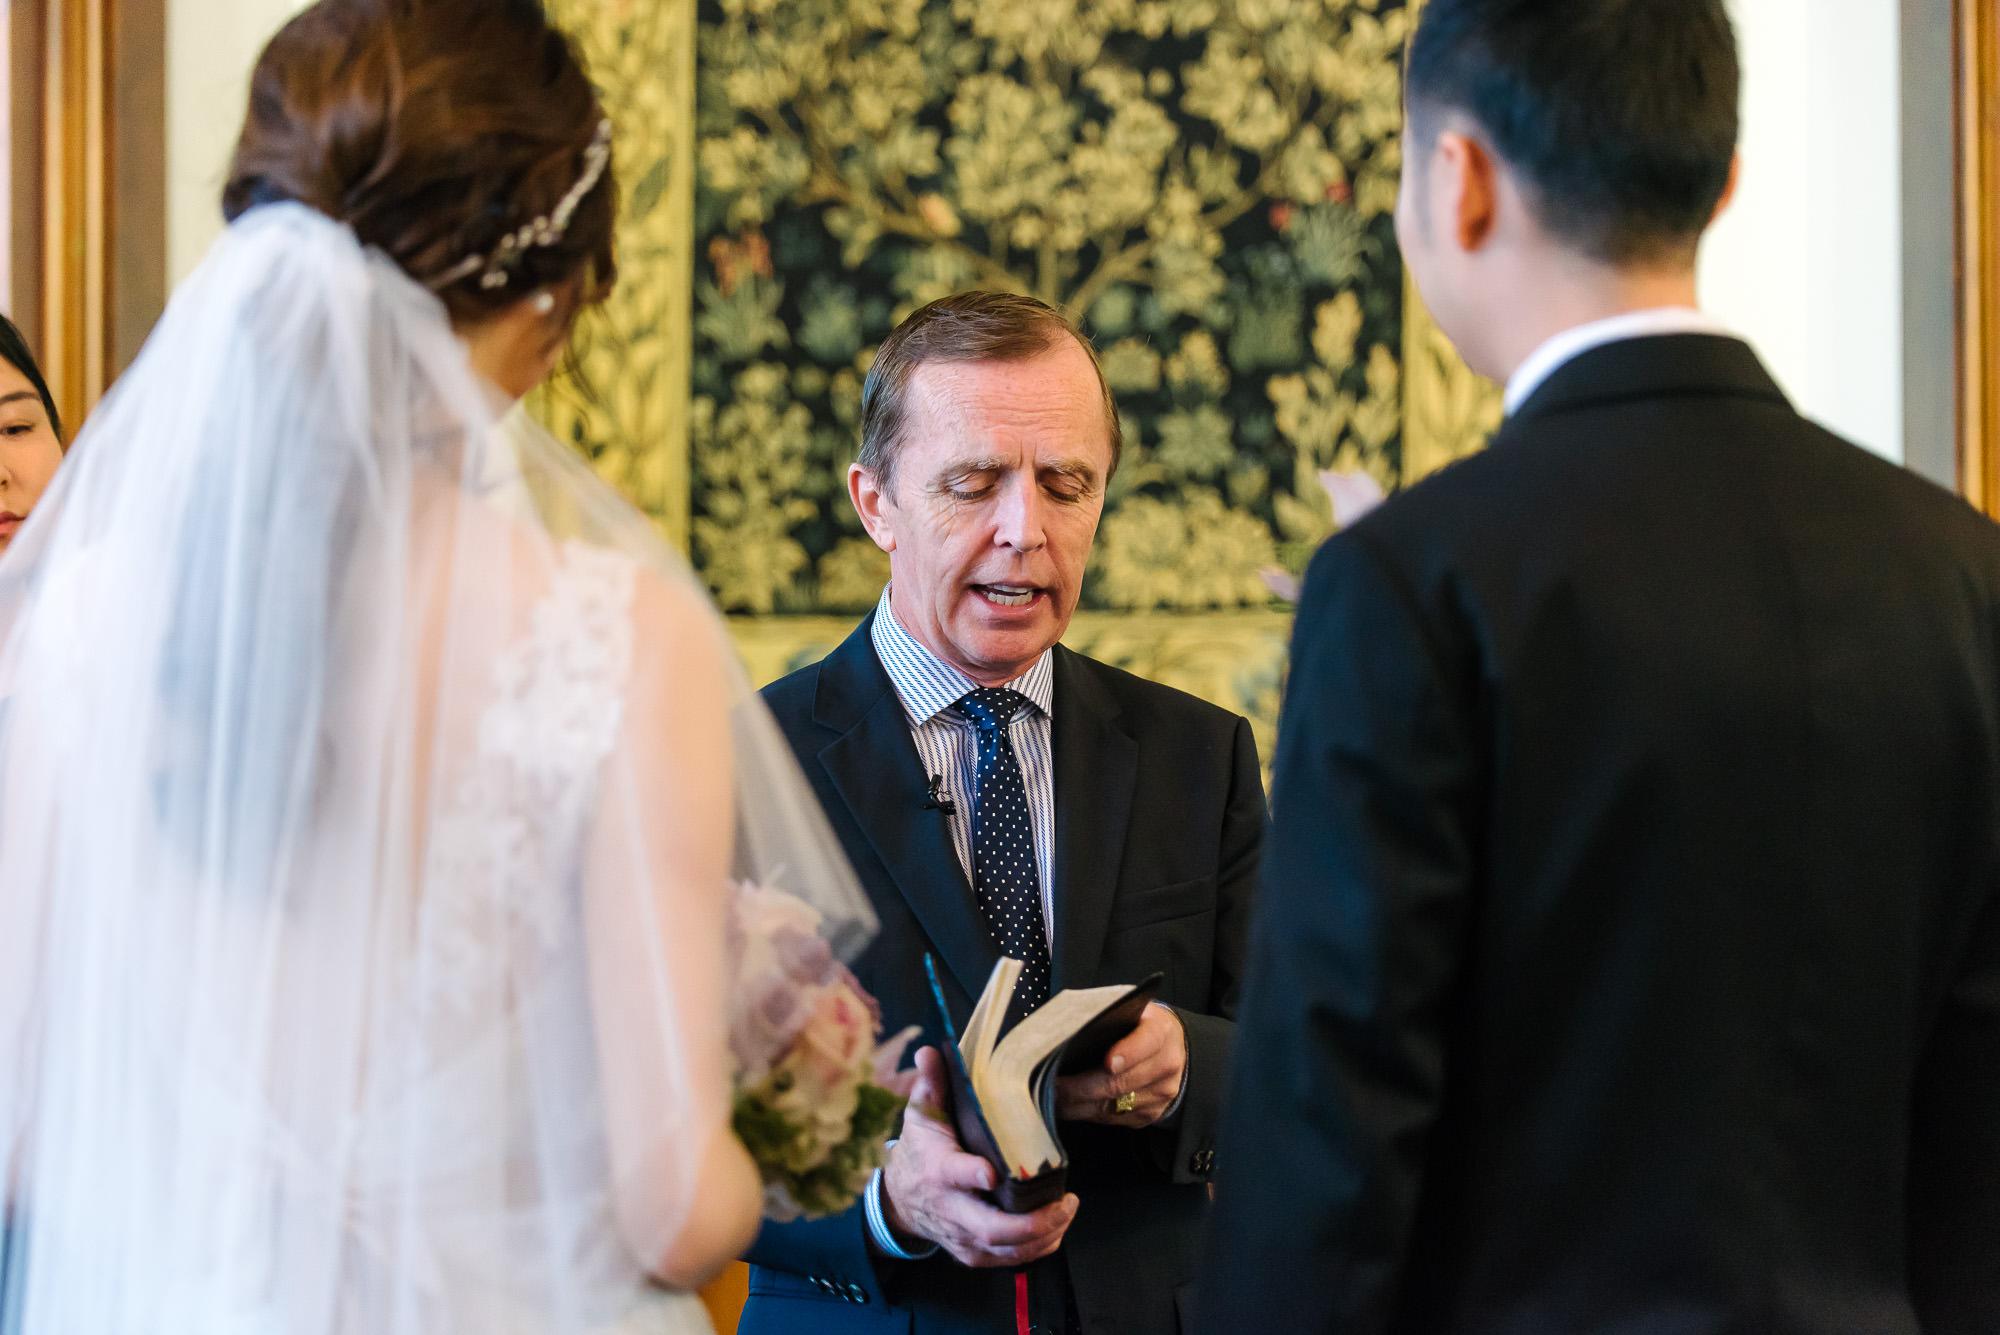 minoru_chapel_richmond_wedding_ceremony 1610066.jpg